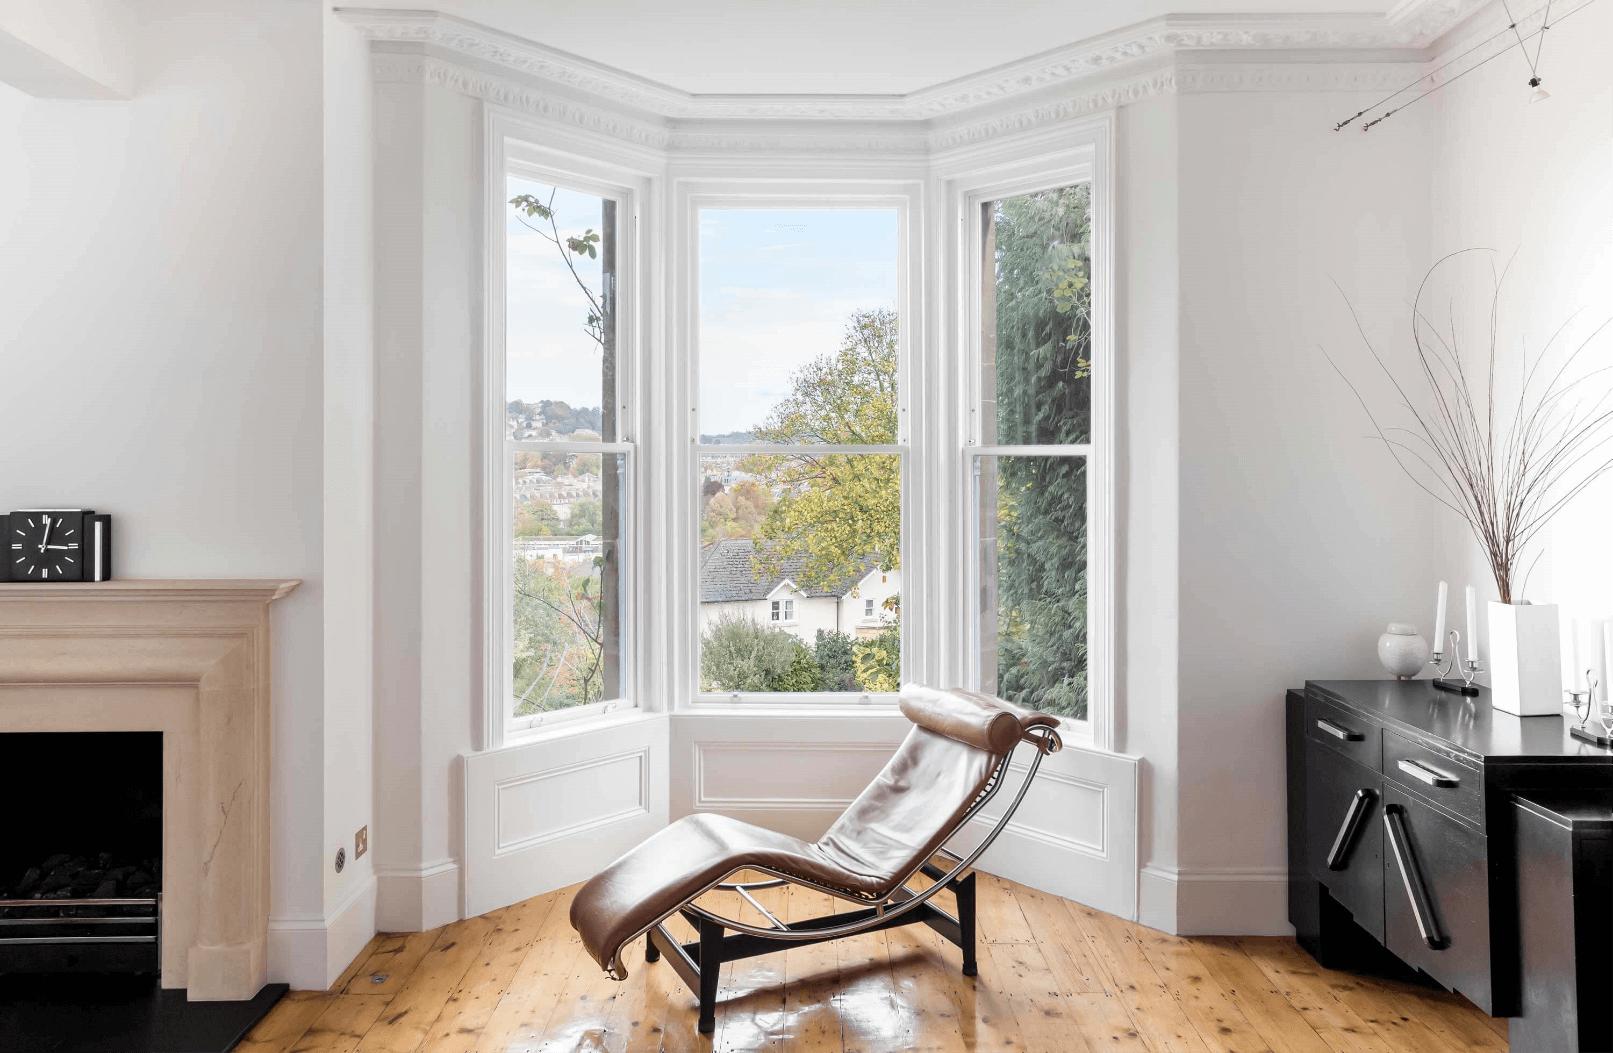 Accoya sash bay windows, white windows